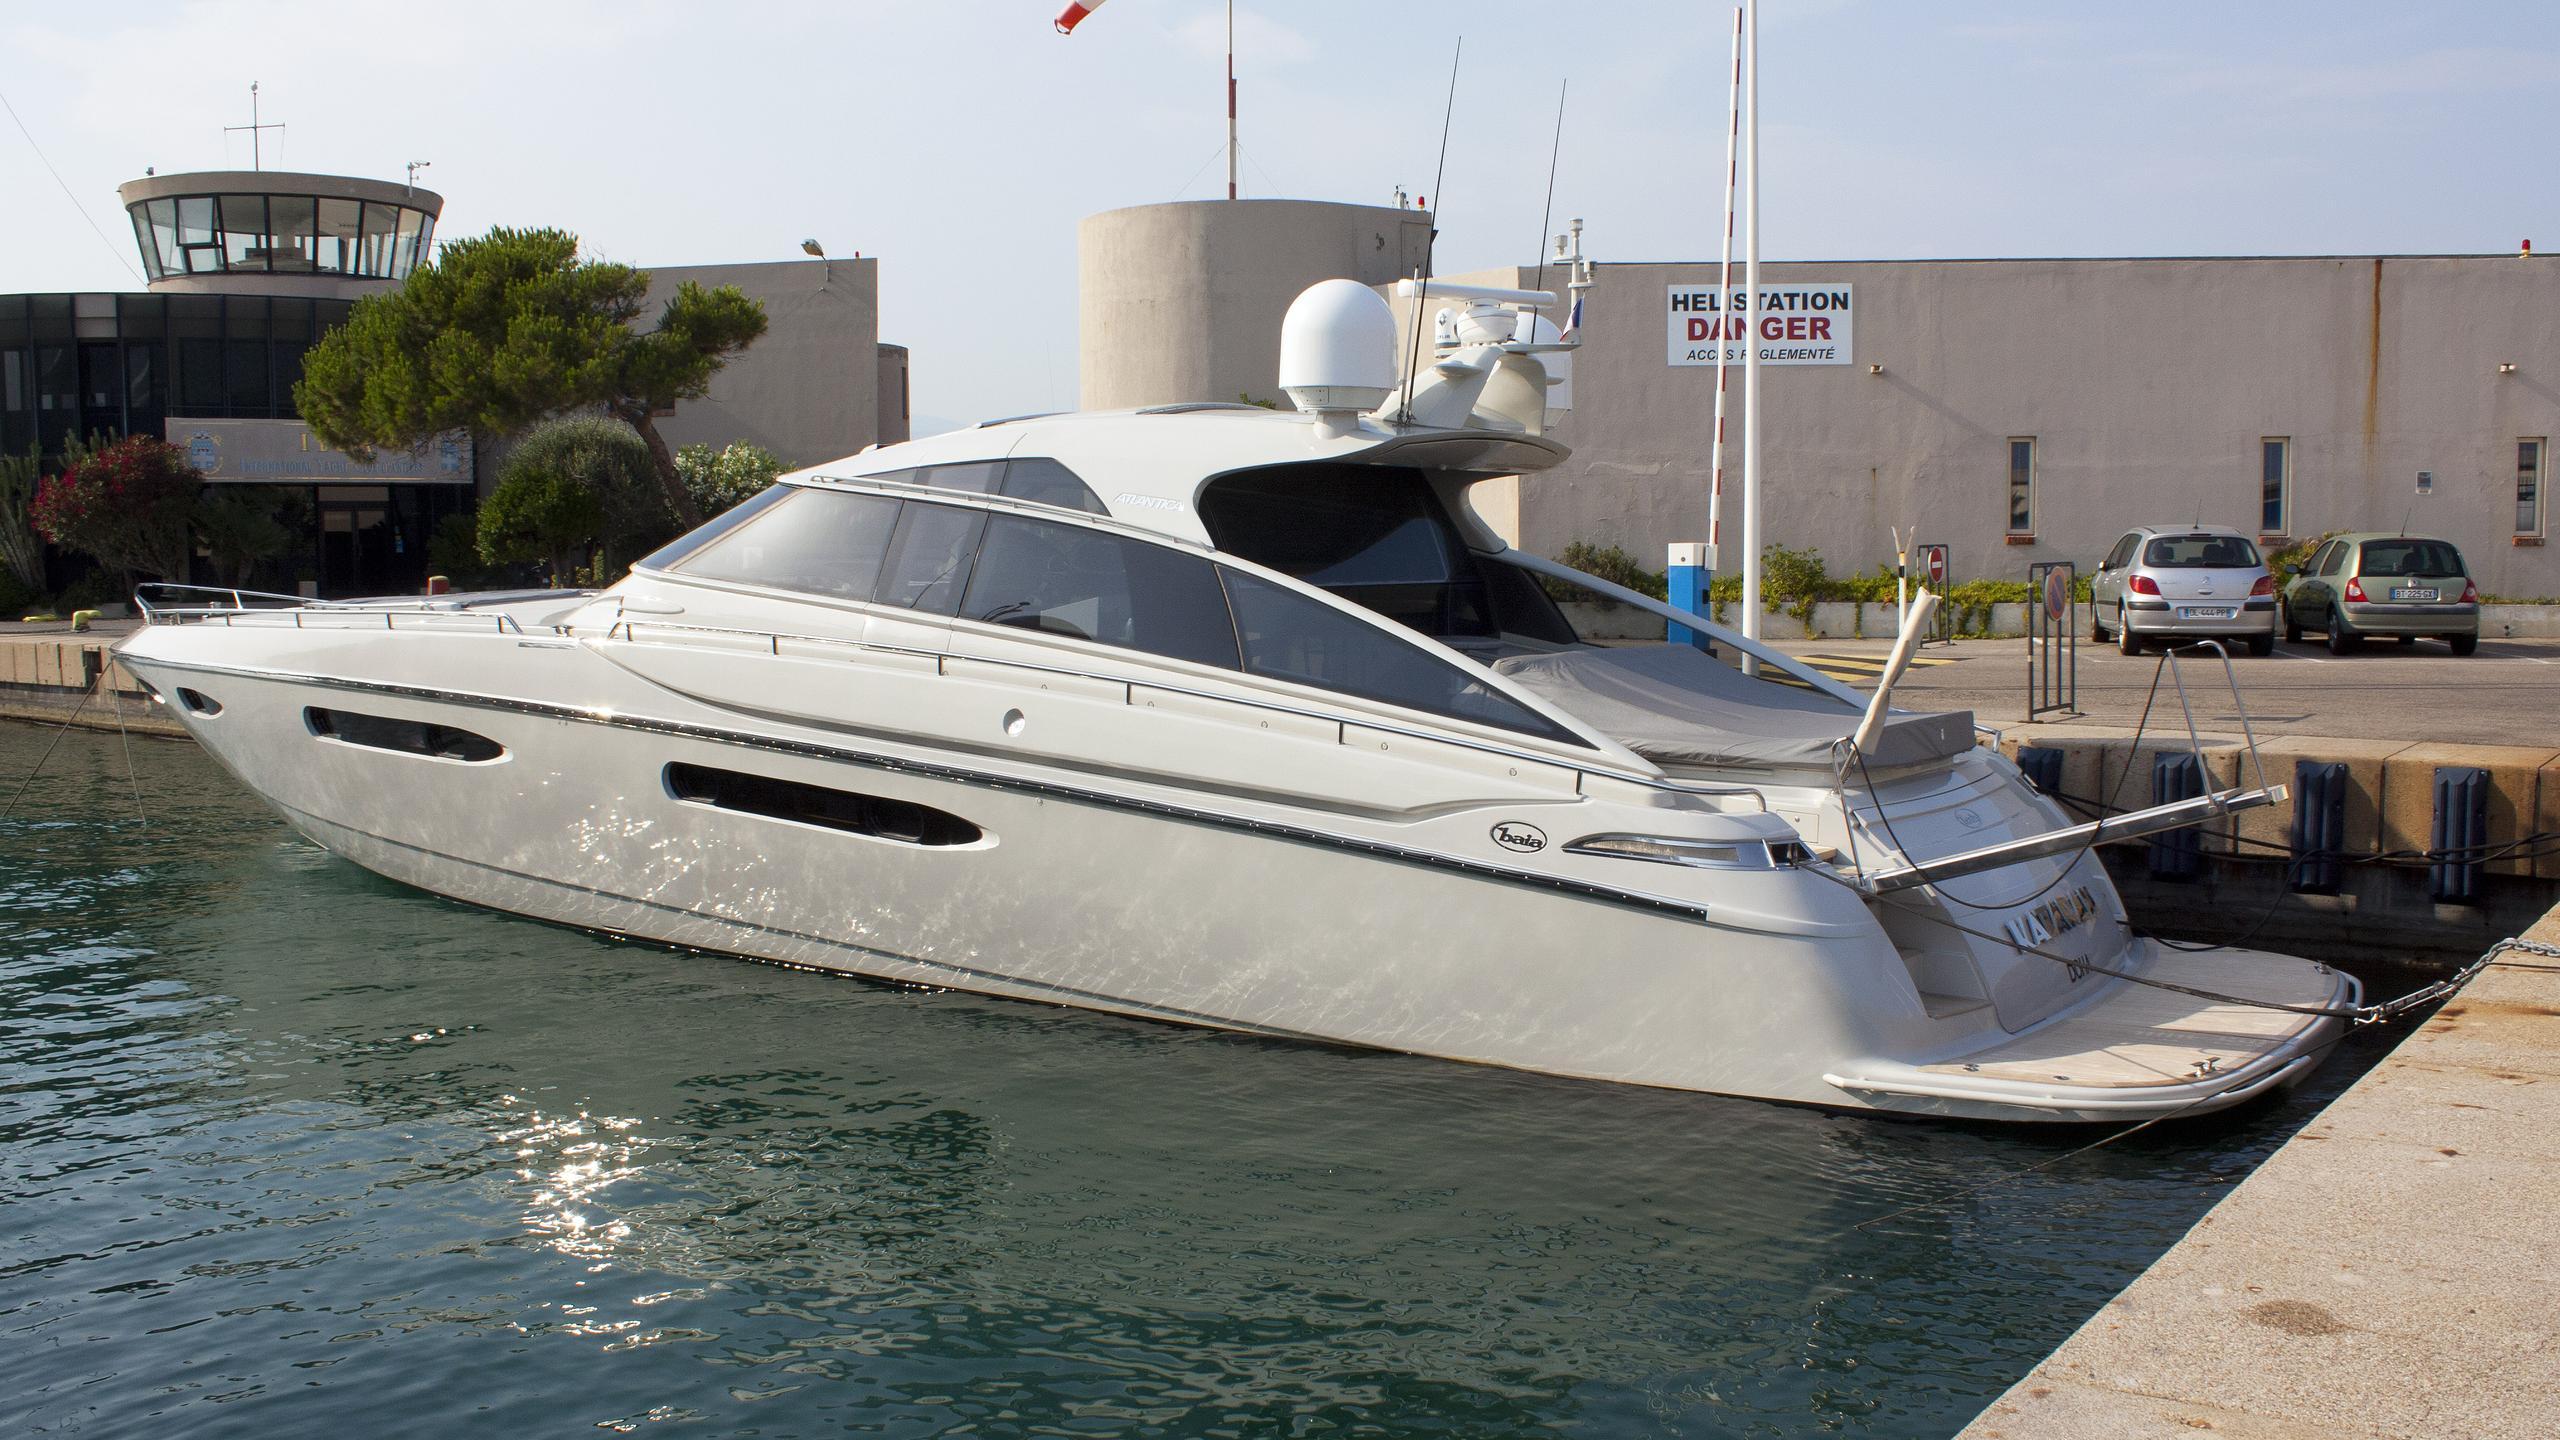 katara-ii-motoryacht-baia-atlantica-2014-24m-stern-view